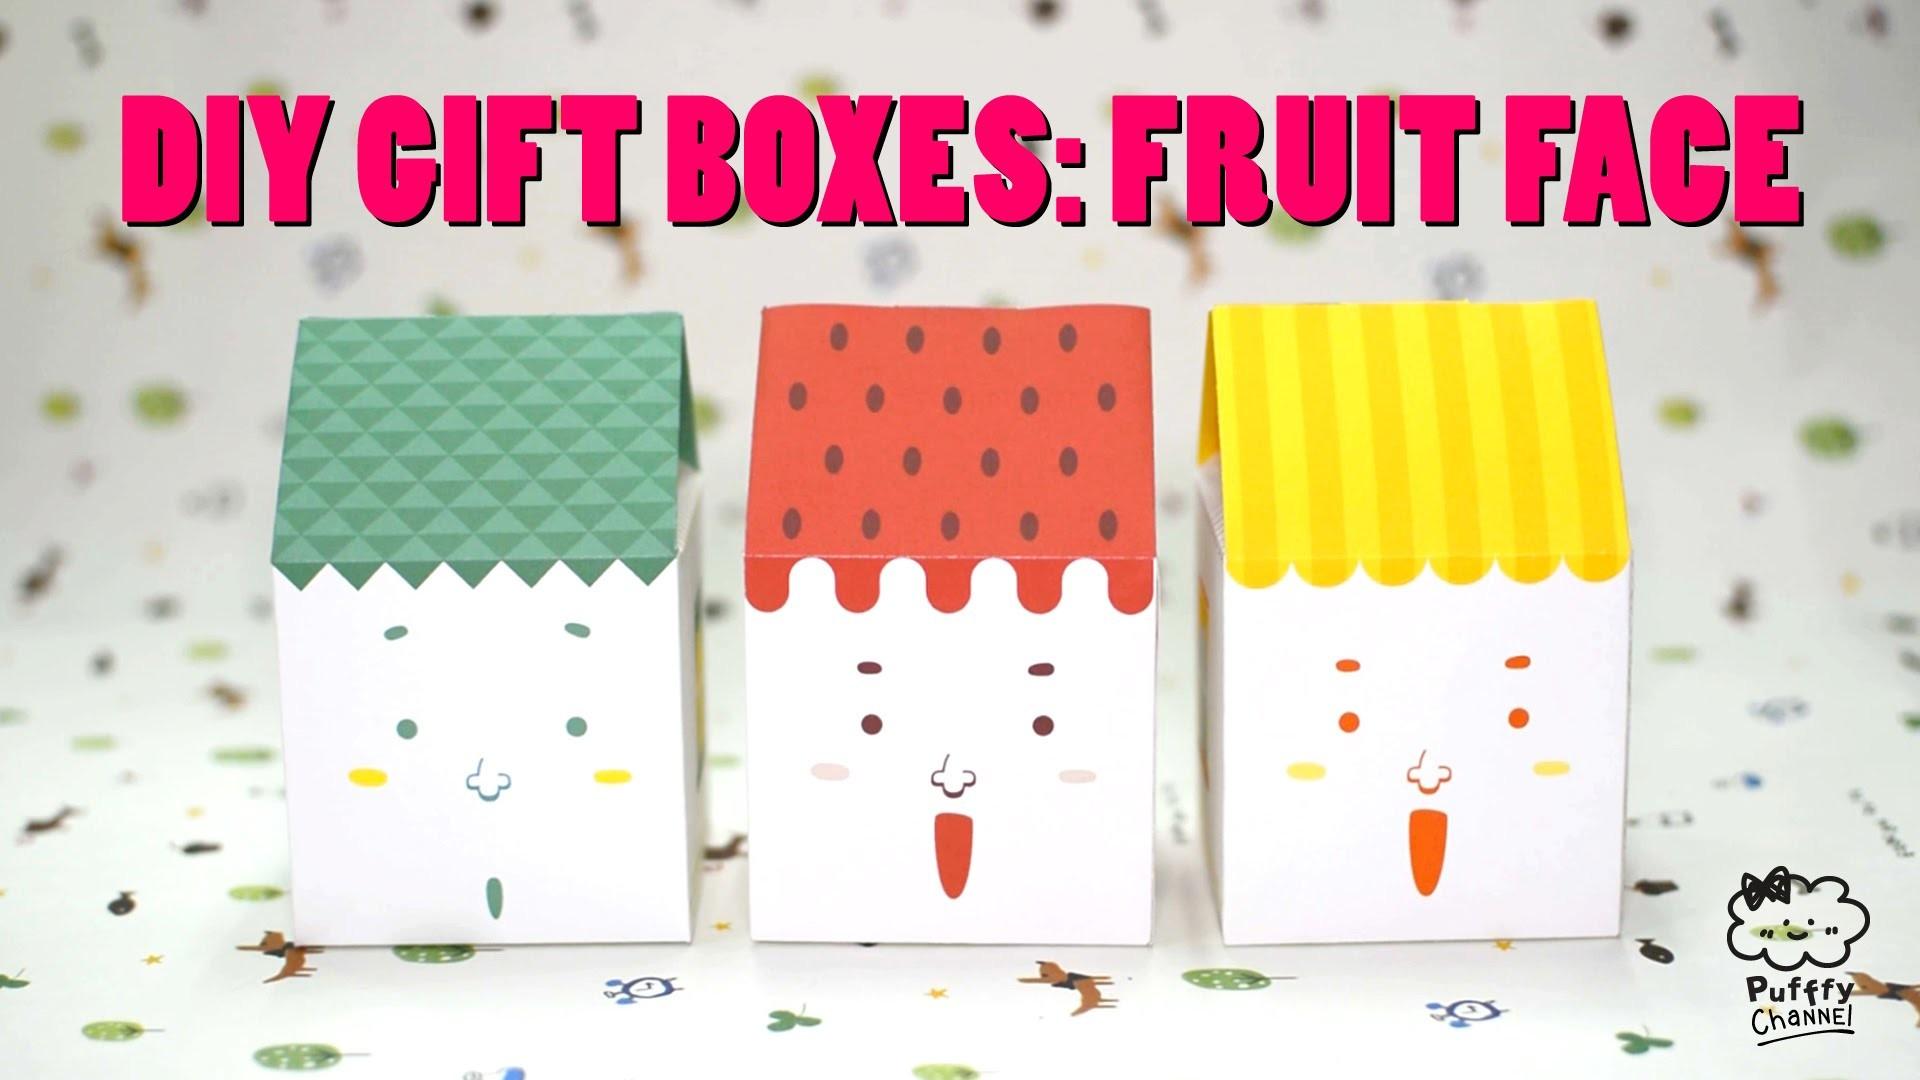 DIY Gift Box Tutorial: Fruit Face House